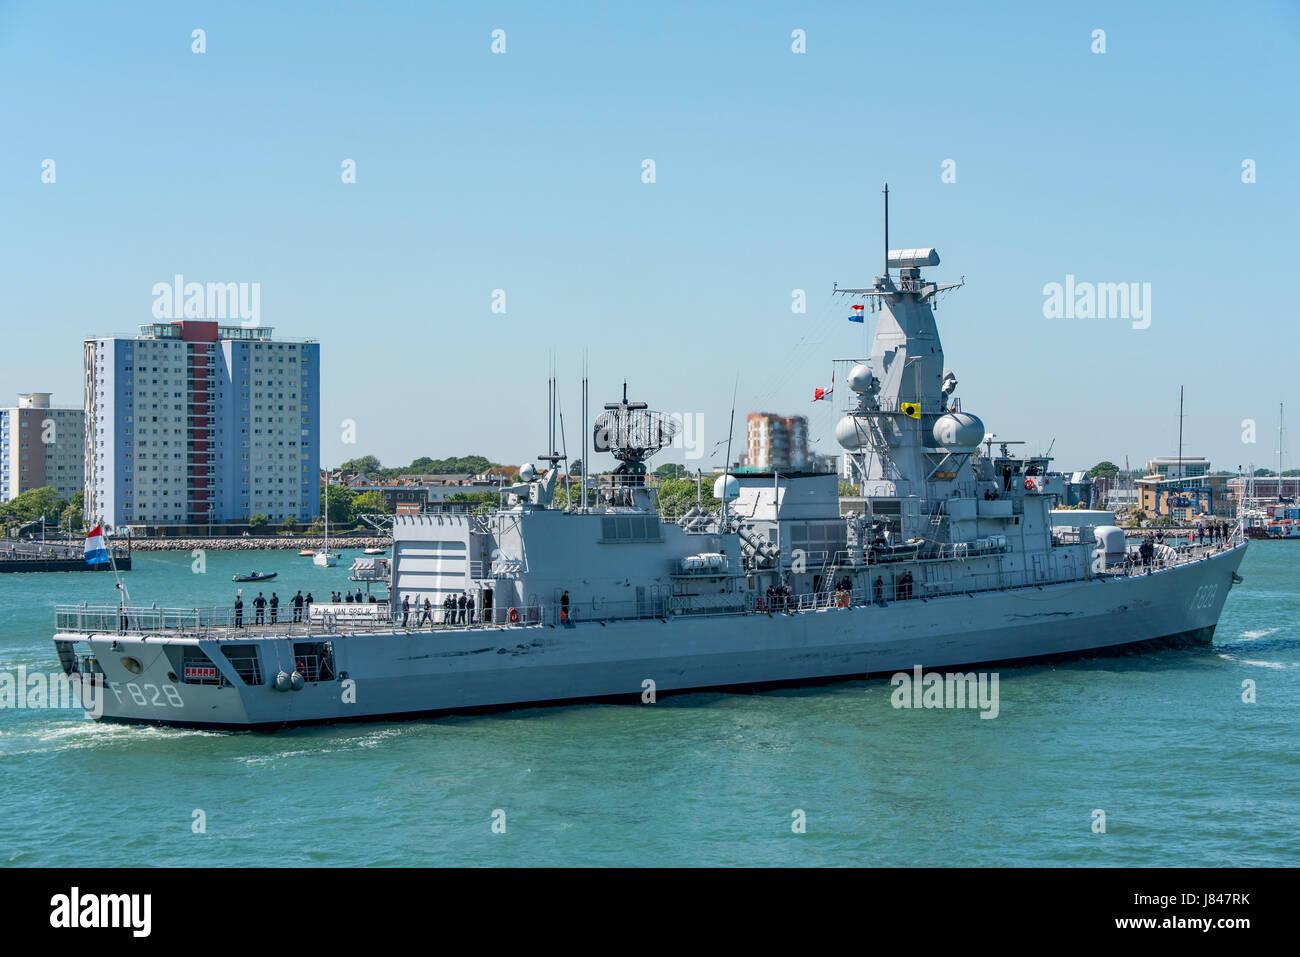 Dutch Navy (Koninklijke Marine) frigate HNLMS Van Speijk (F828) arriving at Portsmouth, UK on the 26th May 2017. - Stock Image